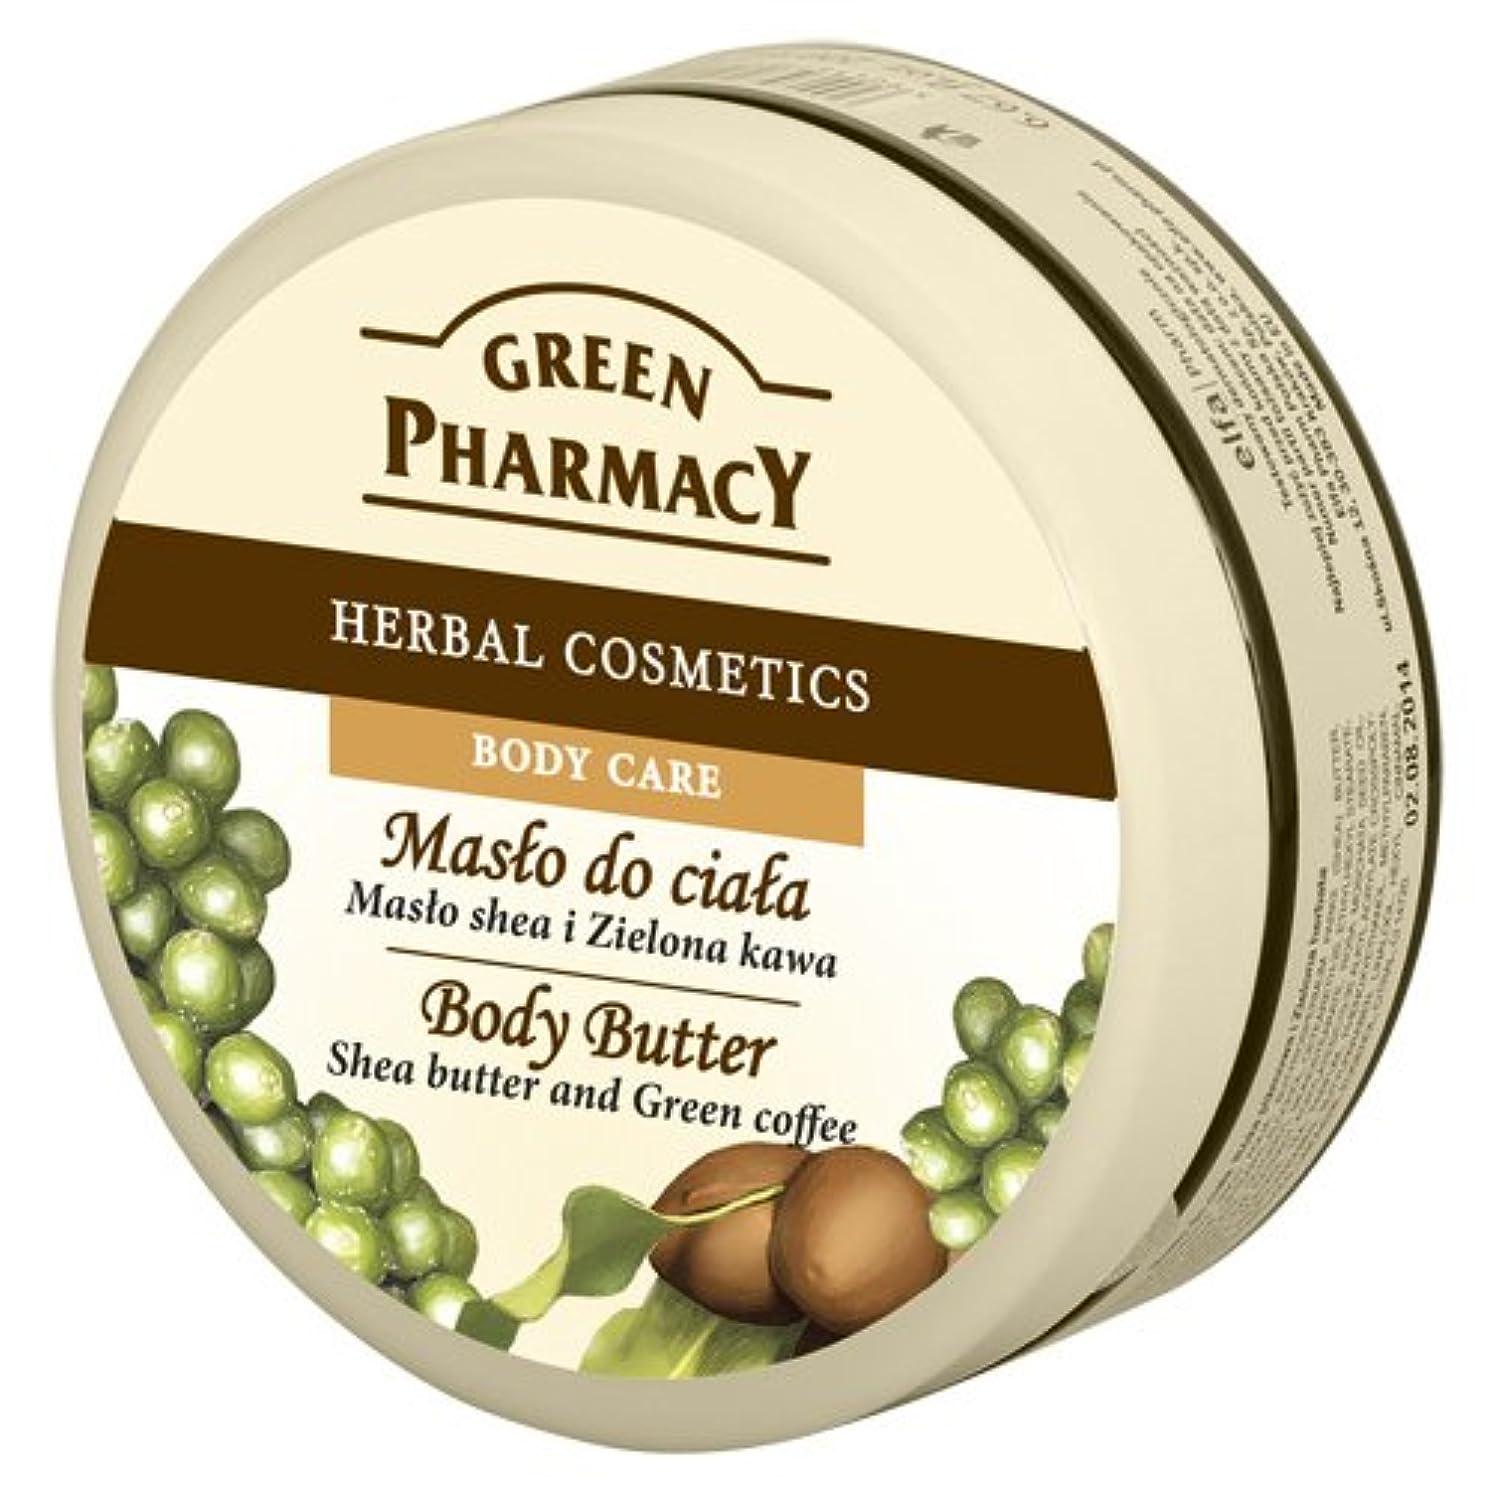 Elfa Pharm Green Pharmacy グリーンファーマシー Body Butter ボディバター Shea Butter and Green Coffee